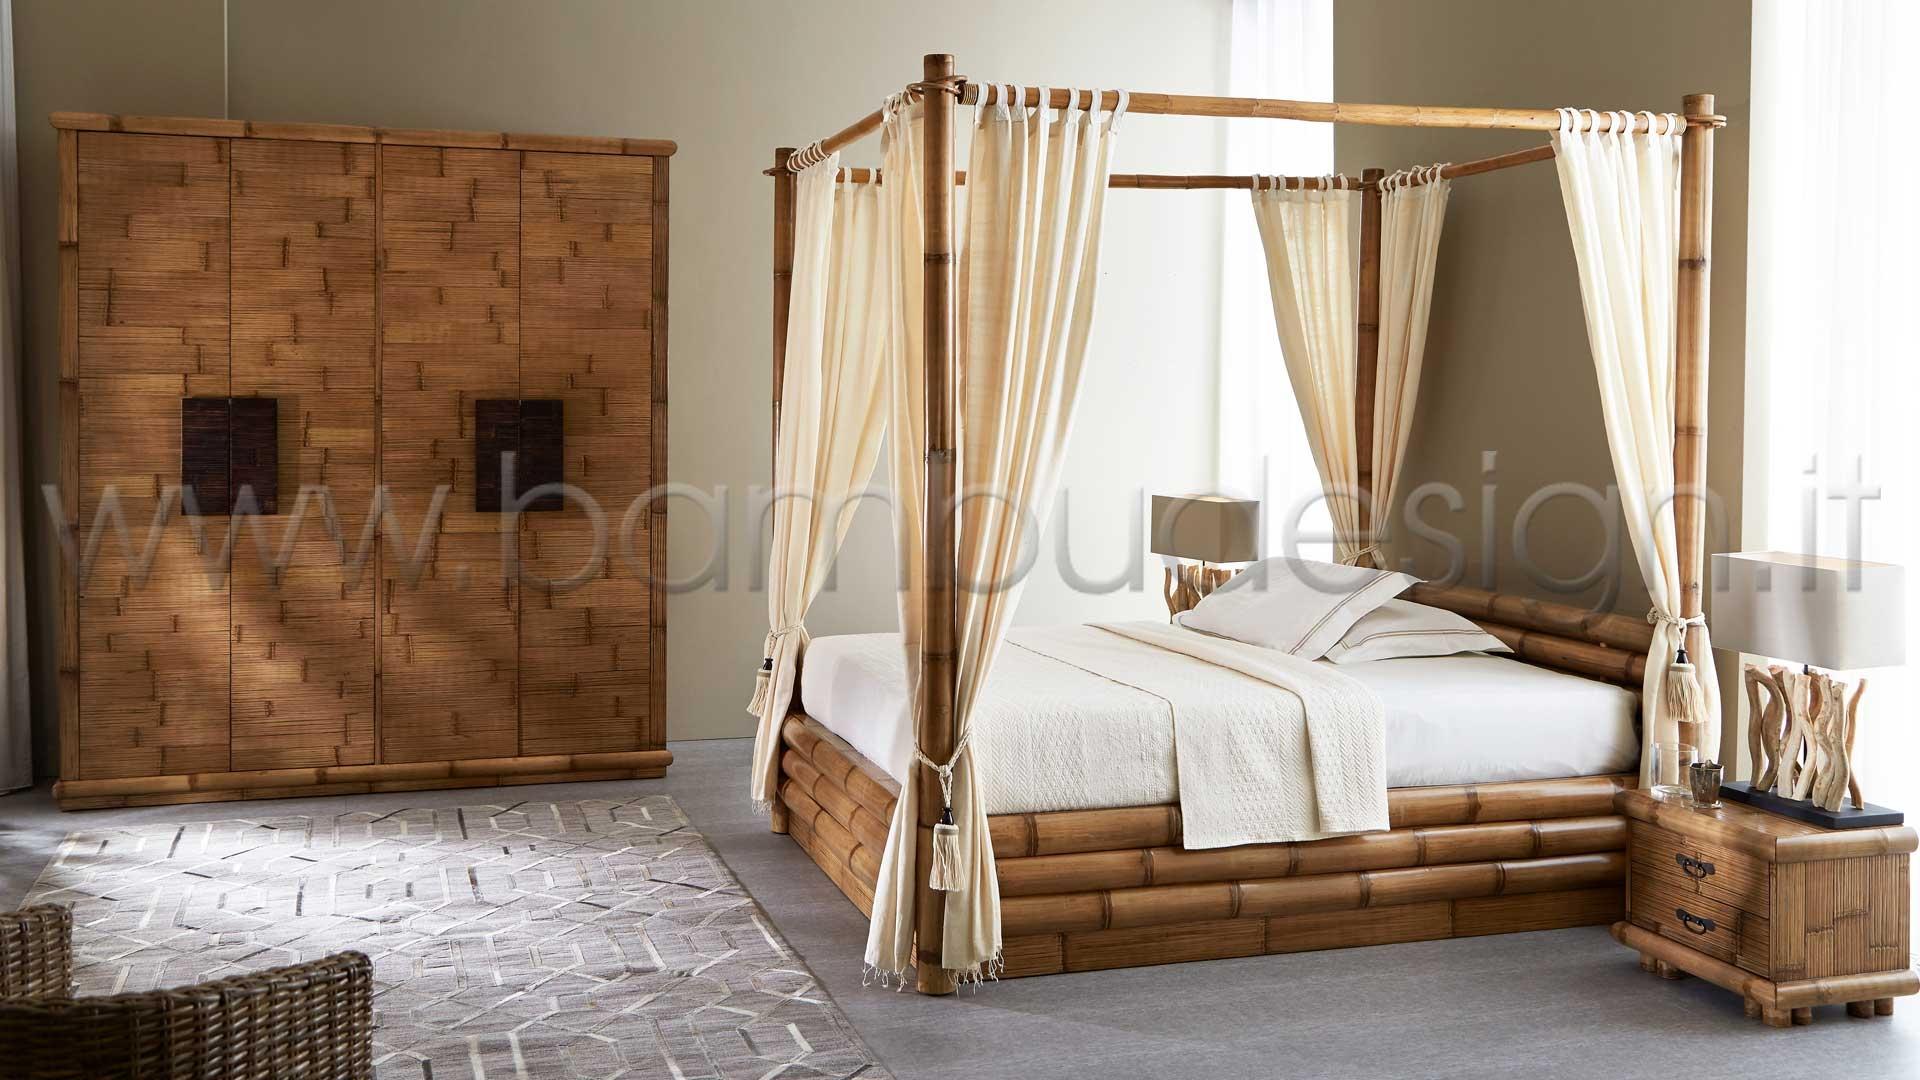 Letto Baldacchino Bambu.Letto In Bambu Baldacchino Matrimoniale Sumba 180x220 H